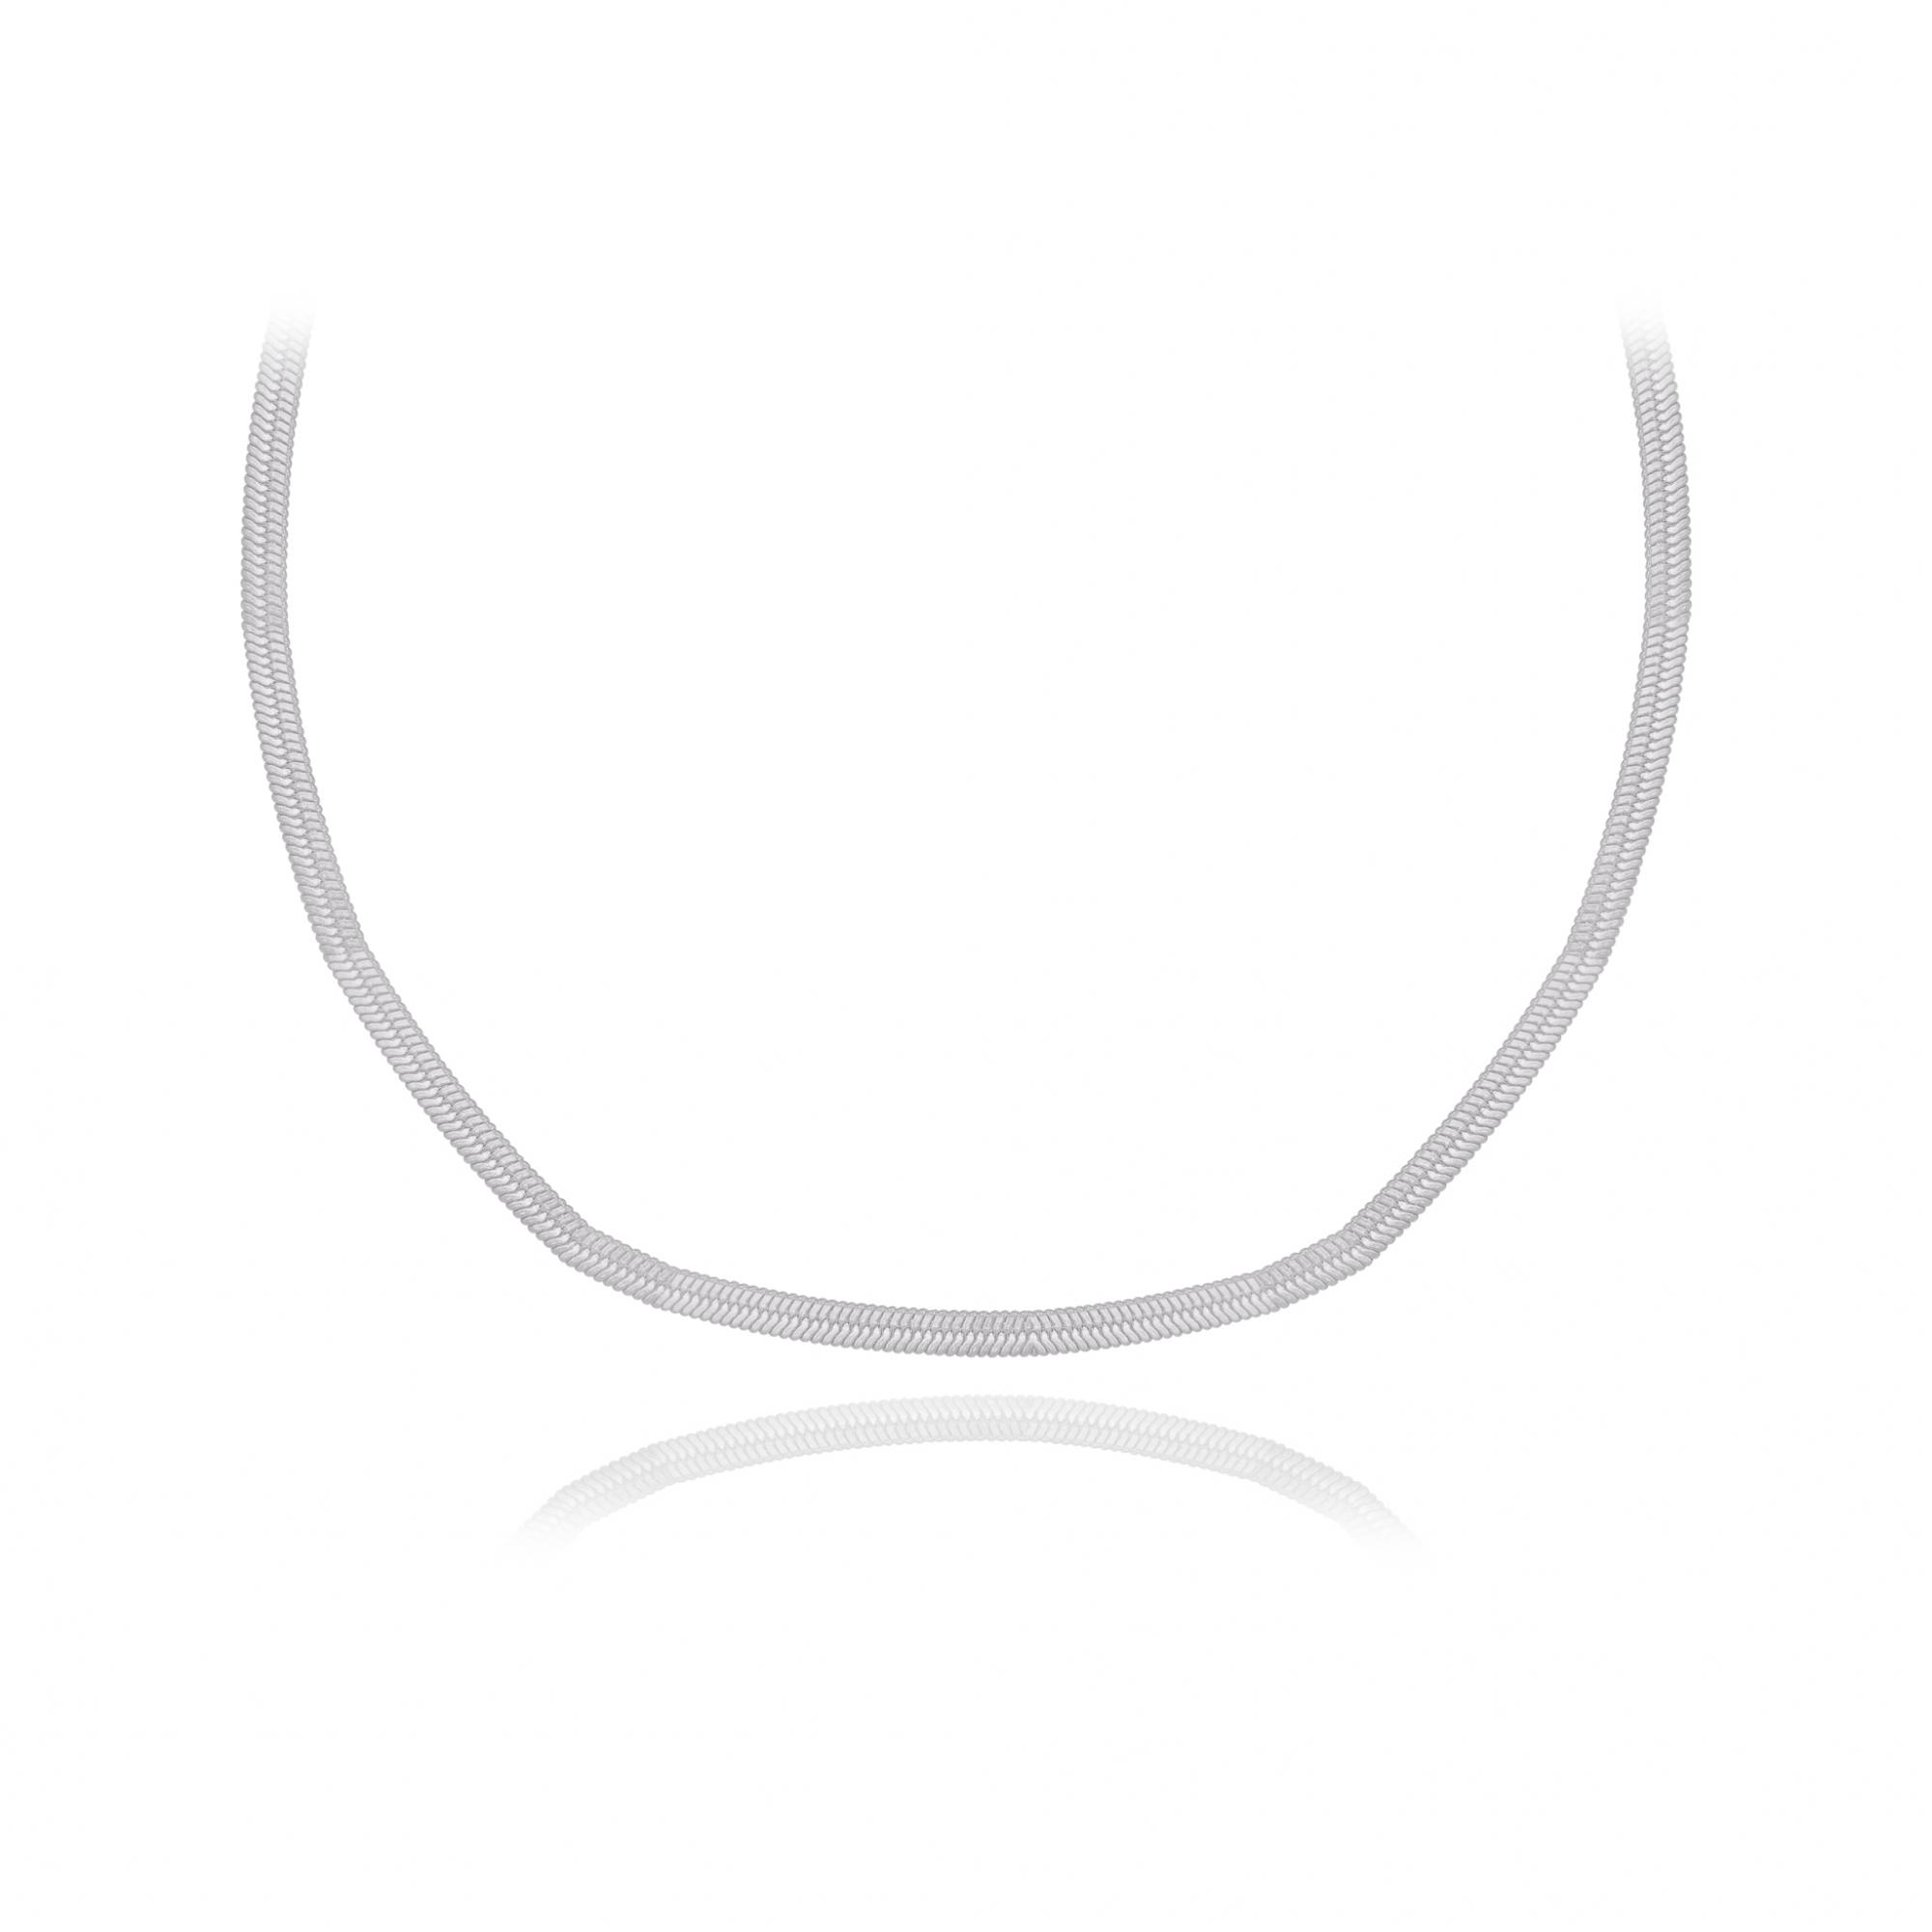 Corrente joia prata 925 maciça modelo Lacraia hipoalergênica